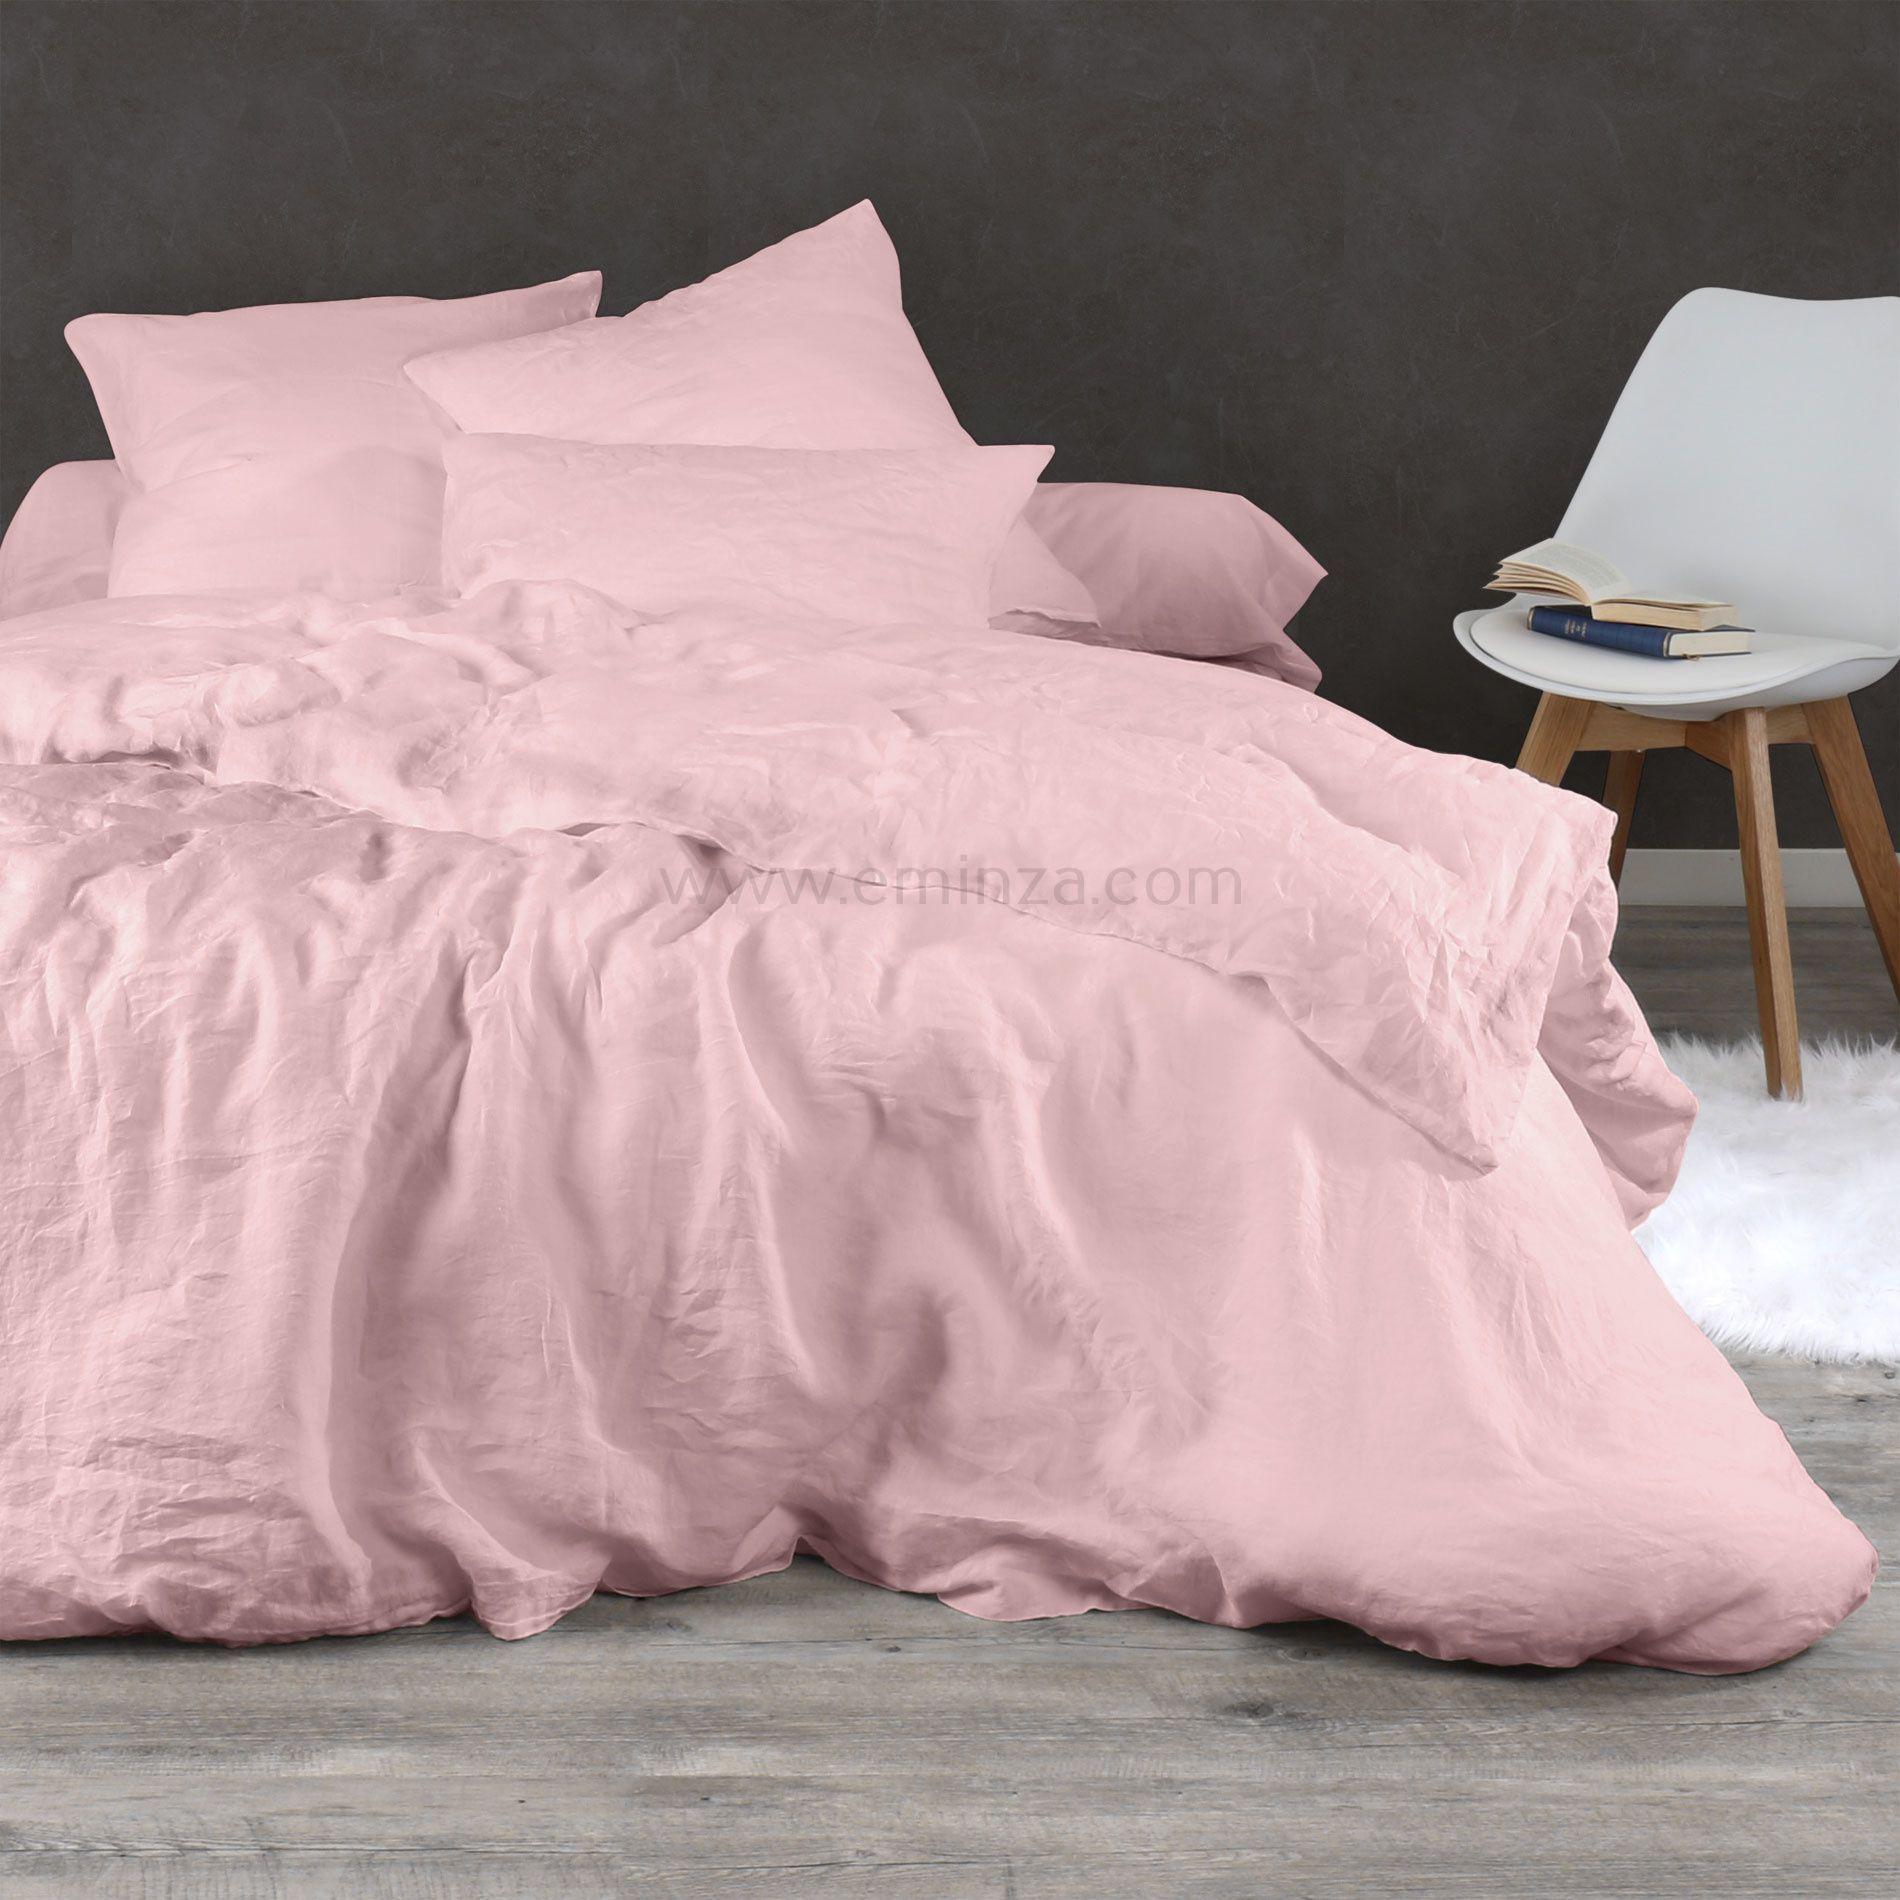 taie d 39 oreiller rectangulaire lin lav pure rose taie d 39 oreiller traversin eminza. Black Bedroom Furniture Sets. Home Design Ideas